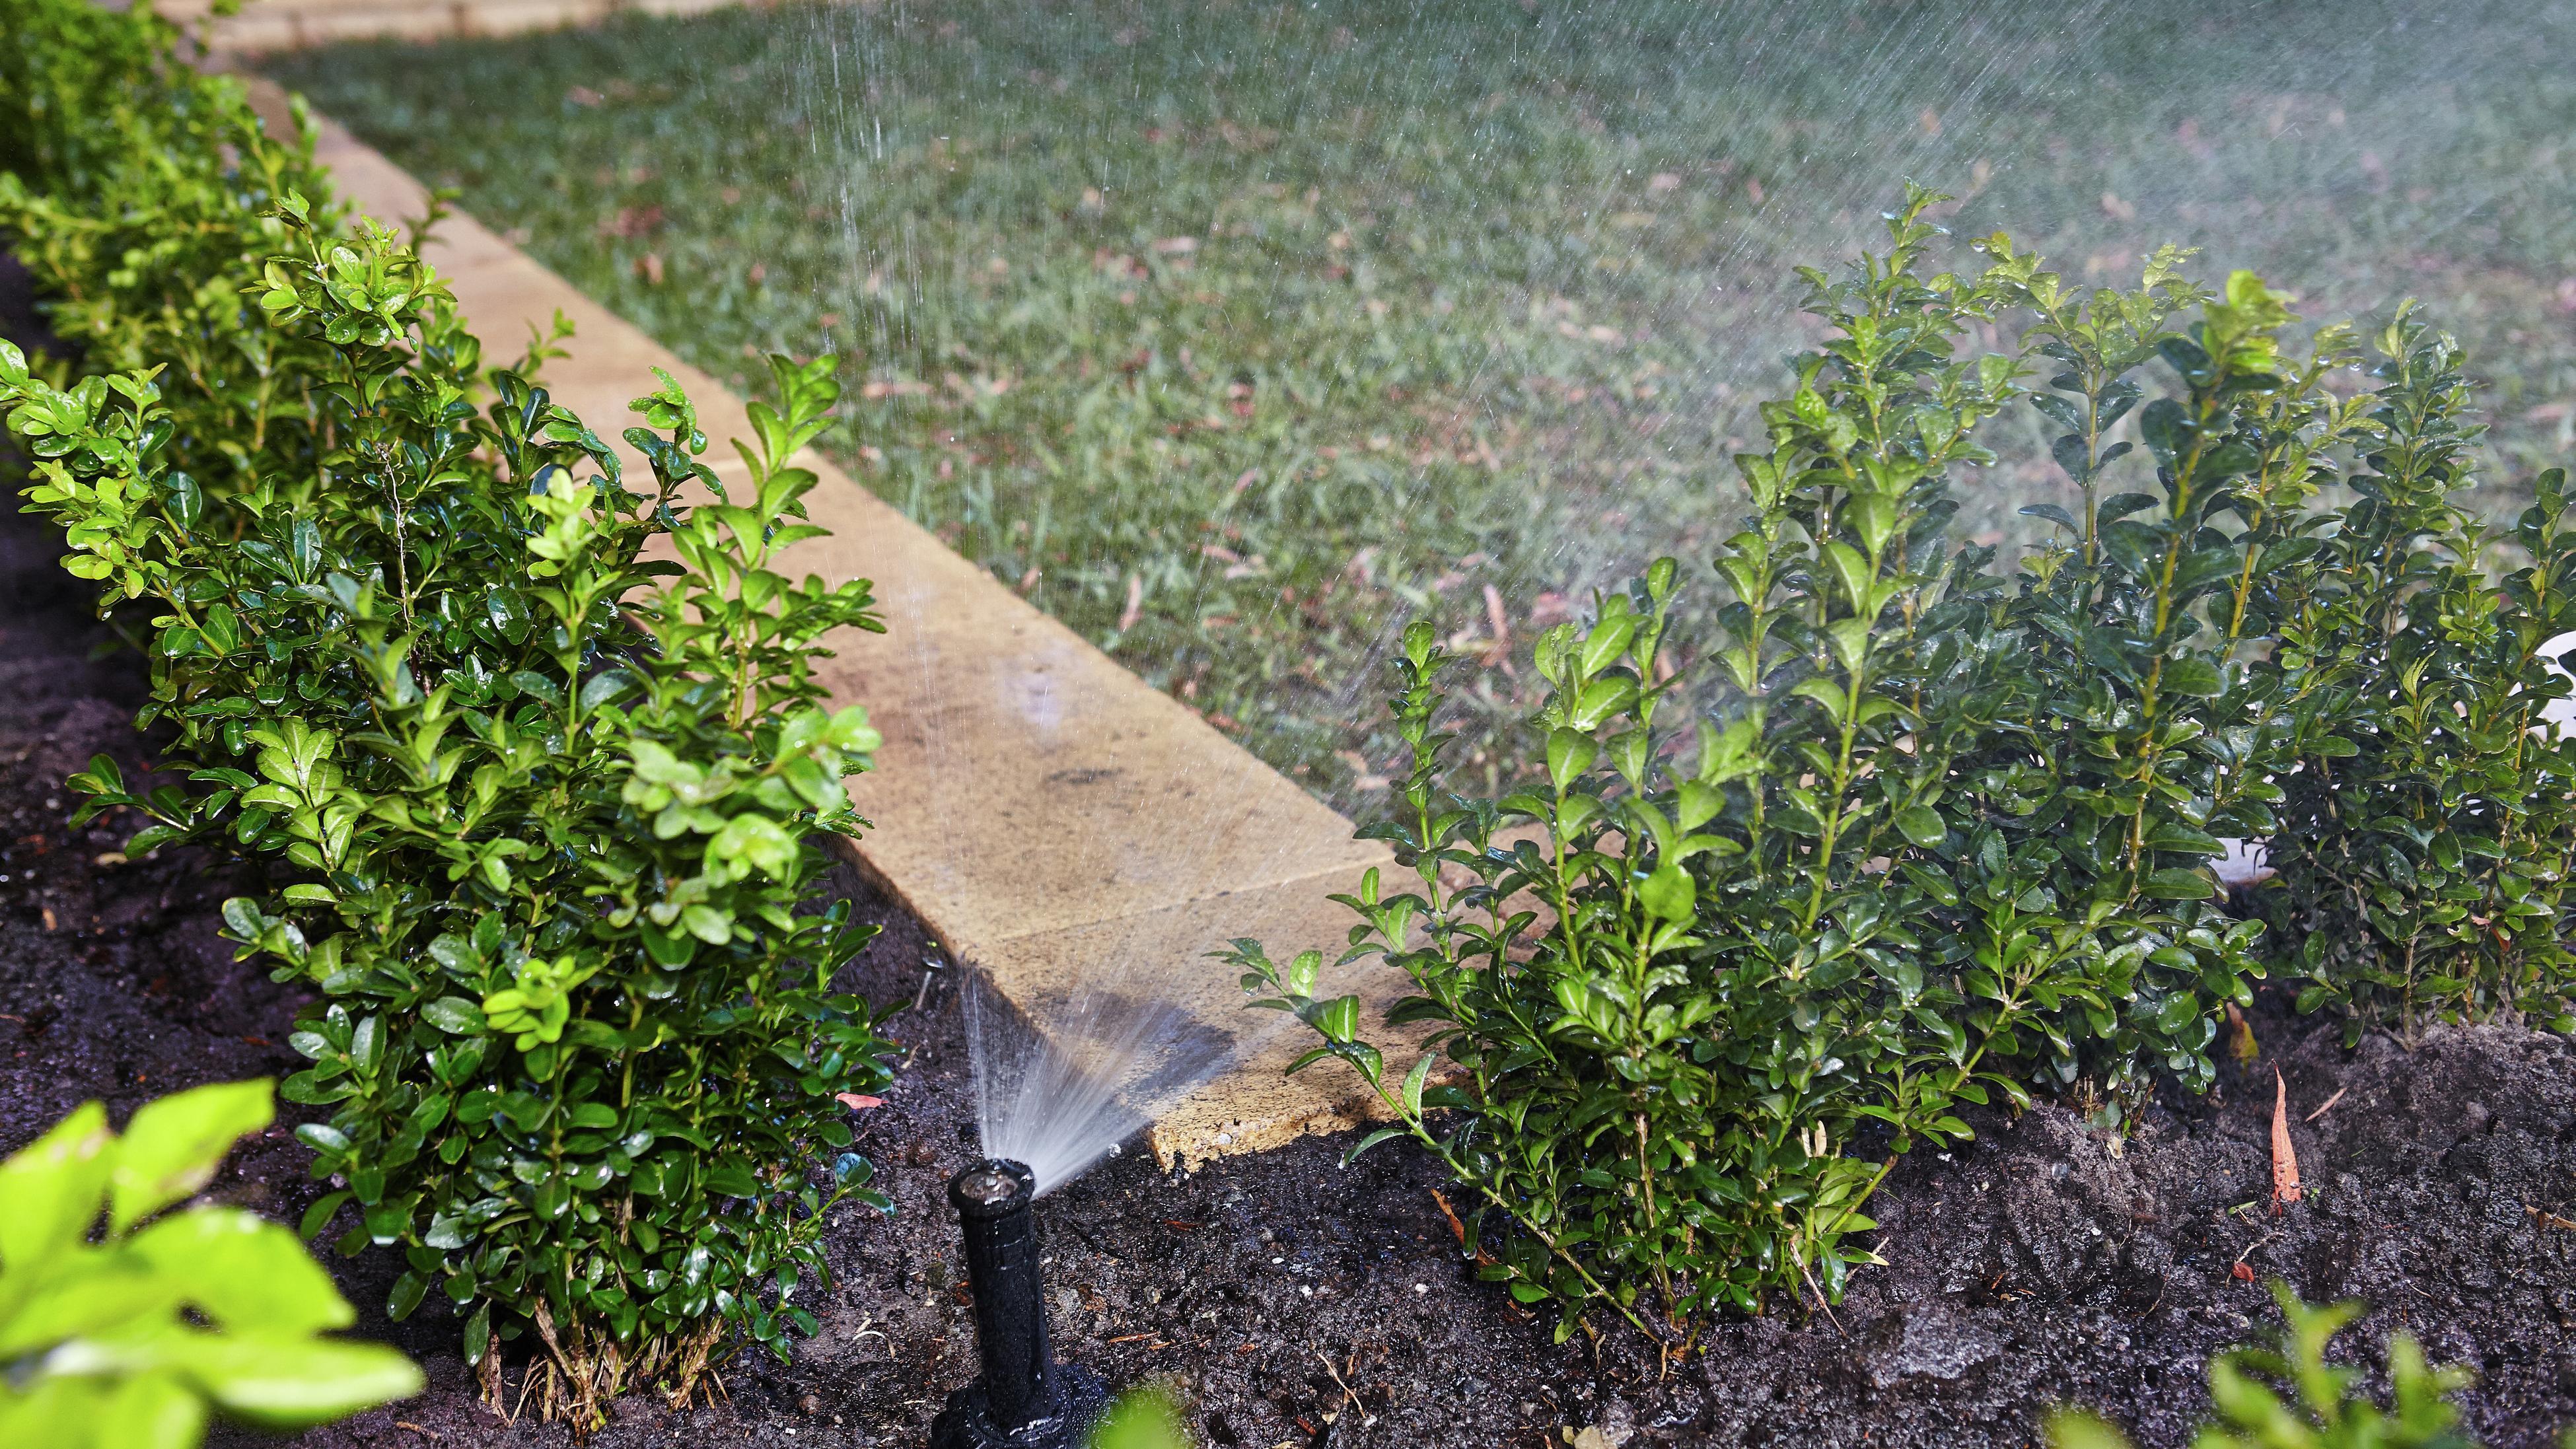 Sprinkler watering lawn and plants.